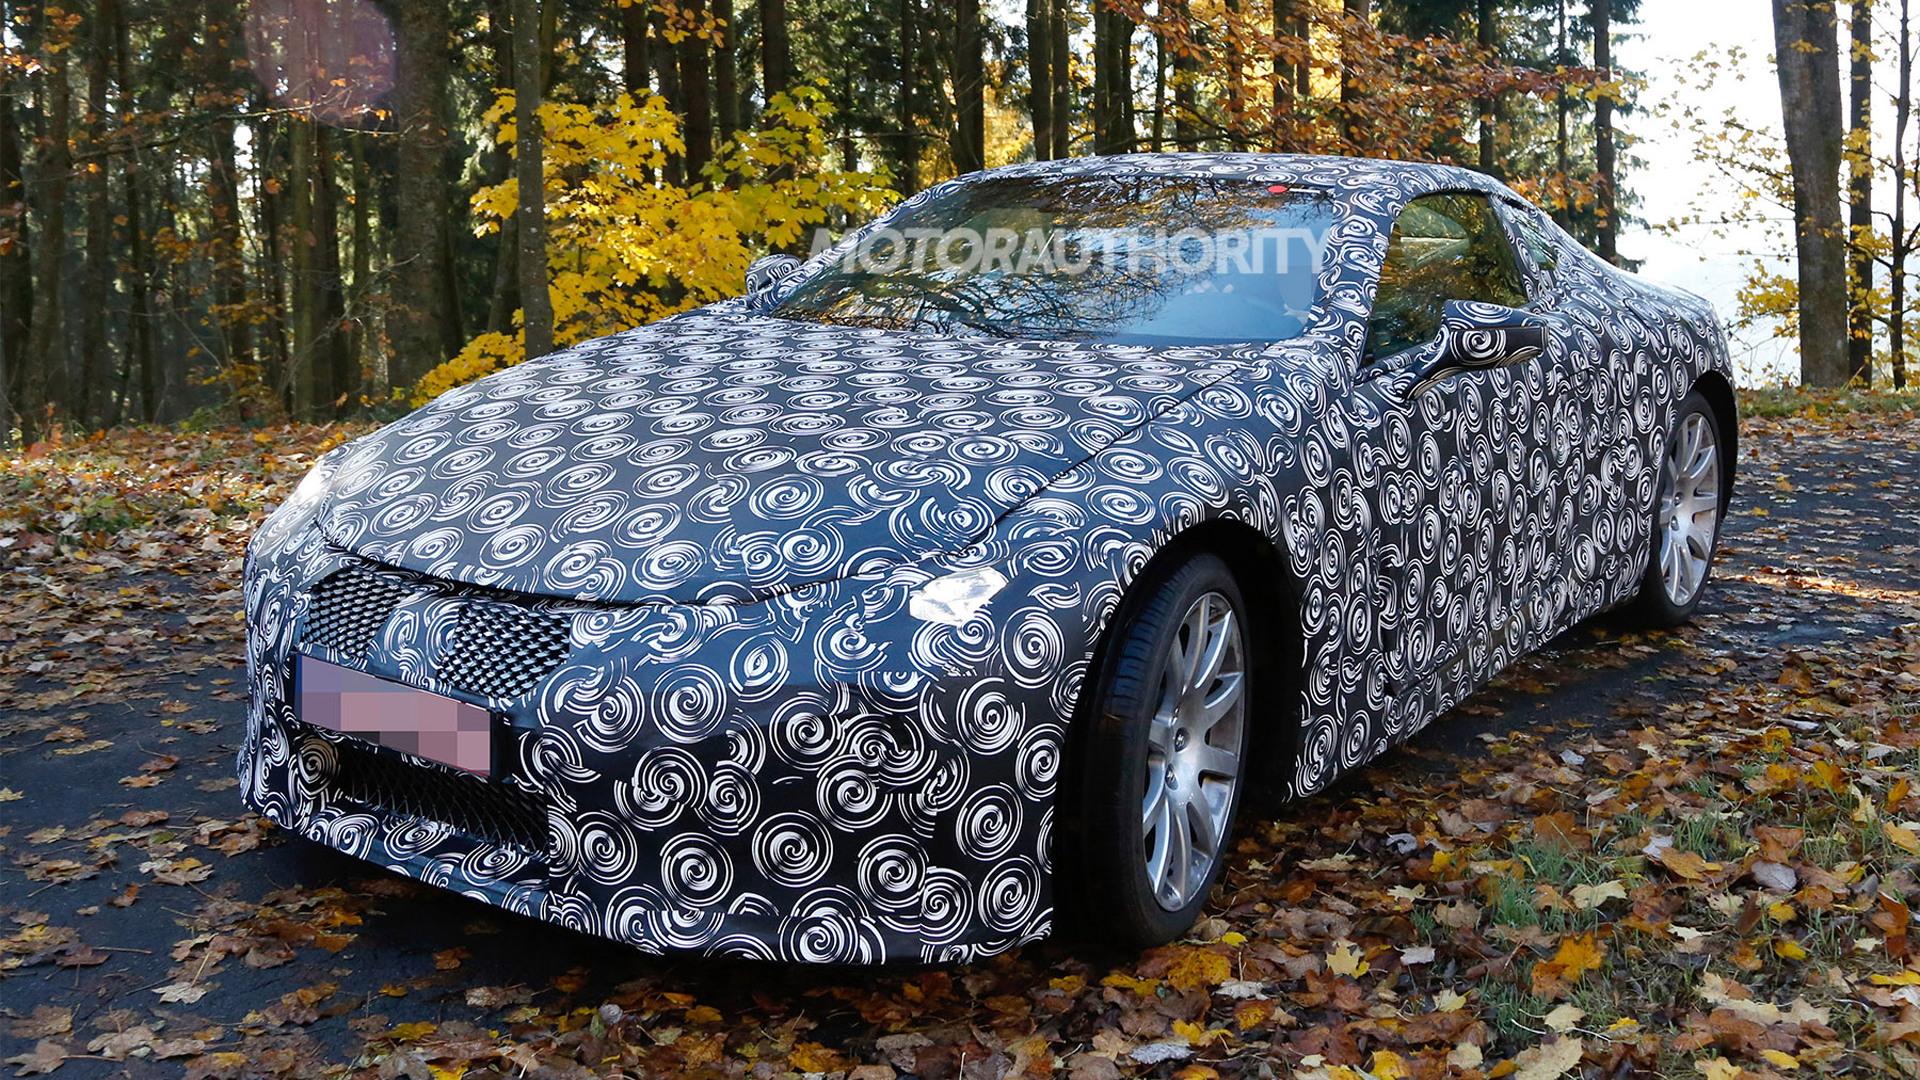 2018 Lexus LC spy shots - Image via S. Baldauf/SB-Medien